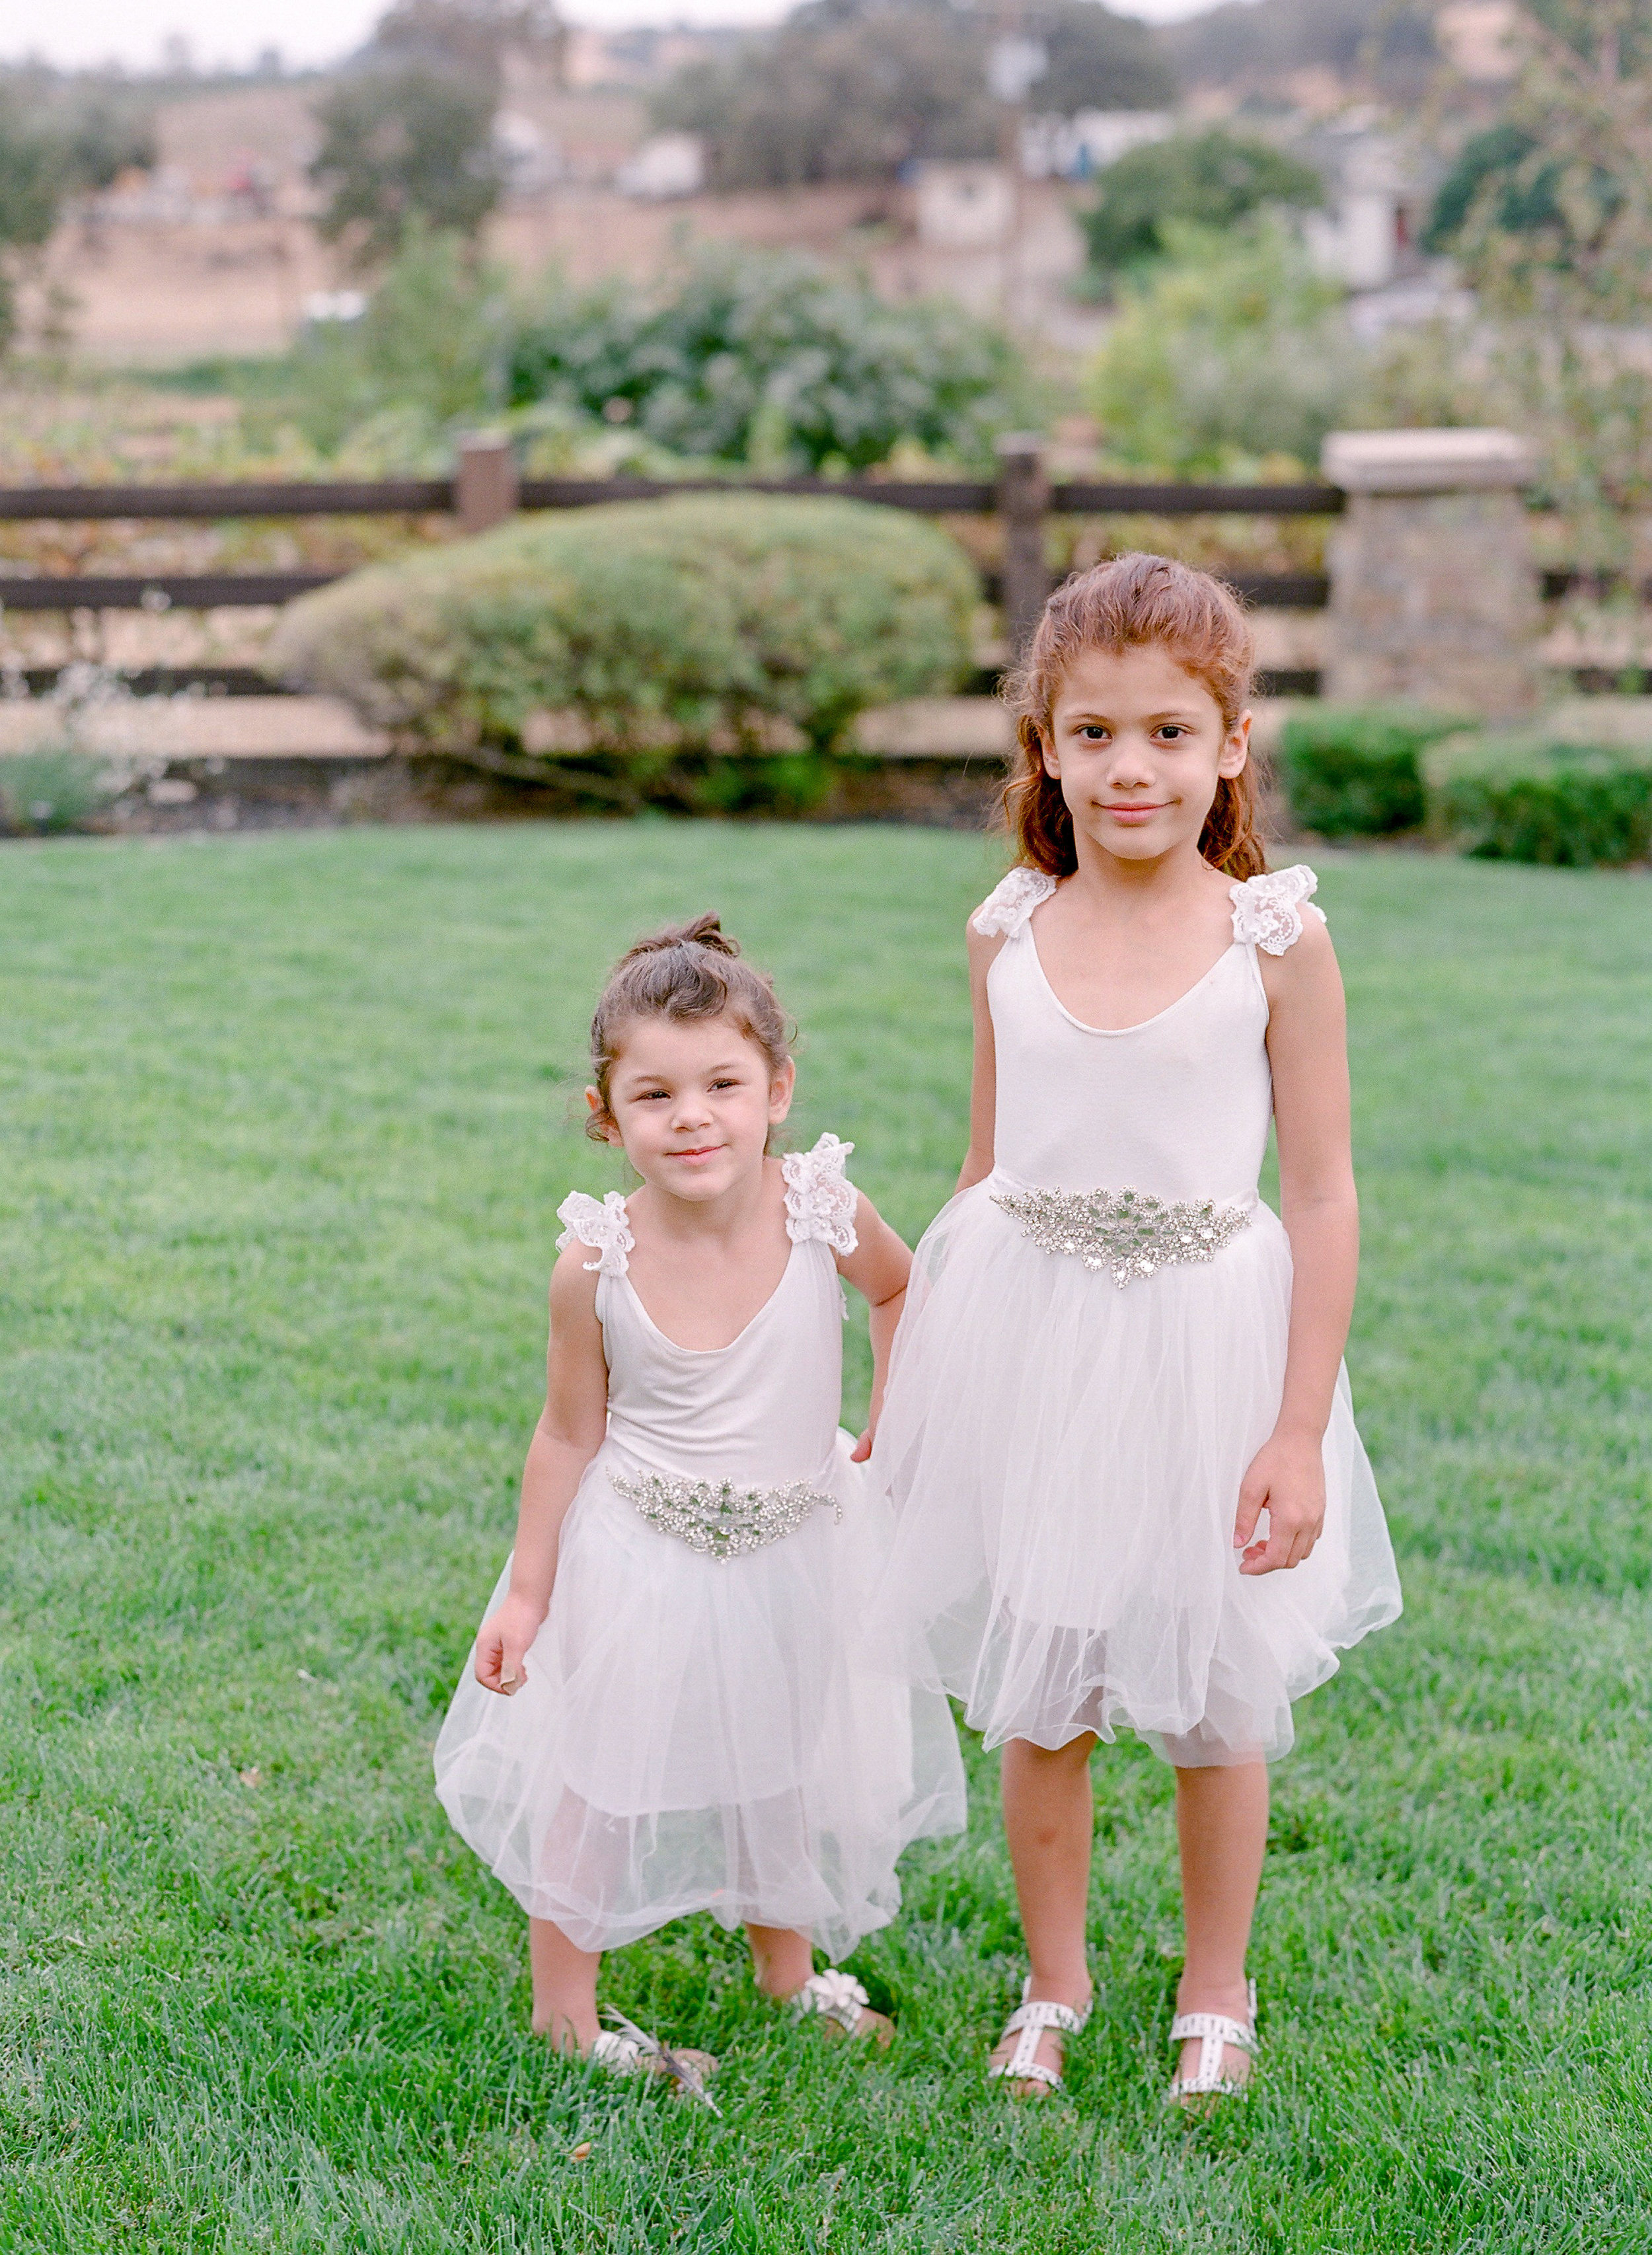 Amador_County_Wedding_Flower_Girl_Dress_Rancho_Victoria_Vineyard_Northern_California.jpg